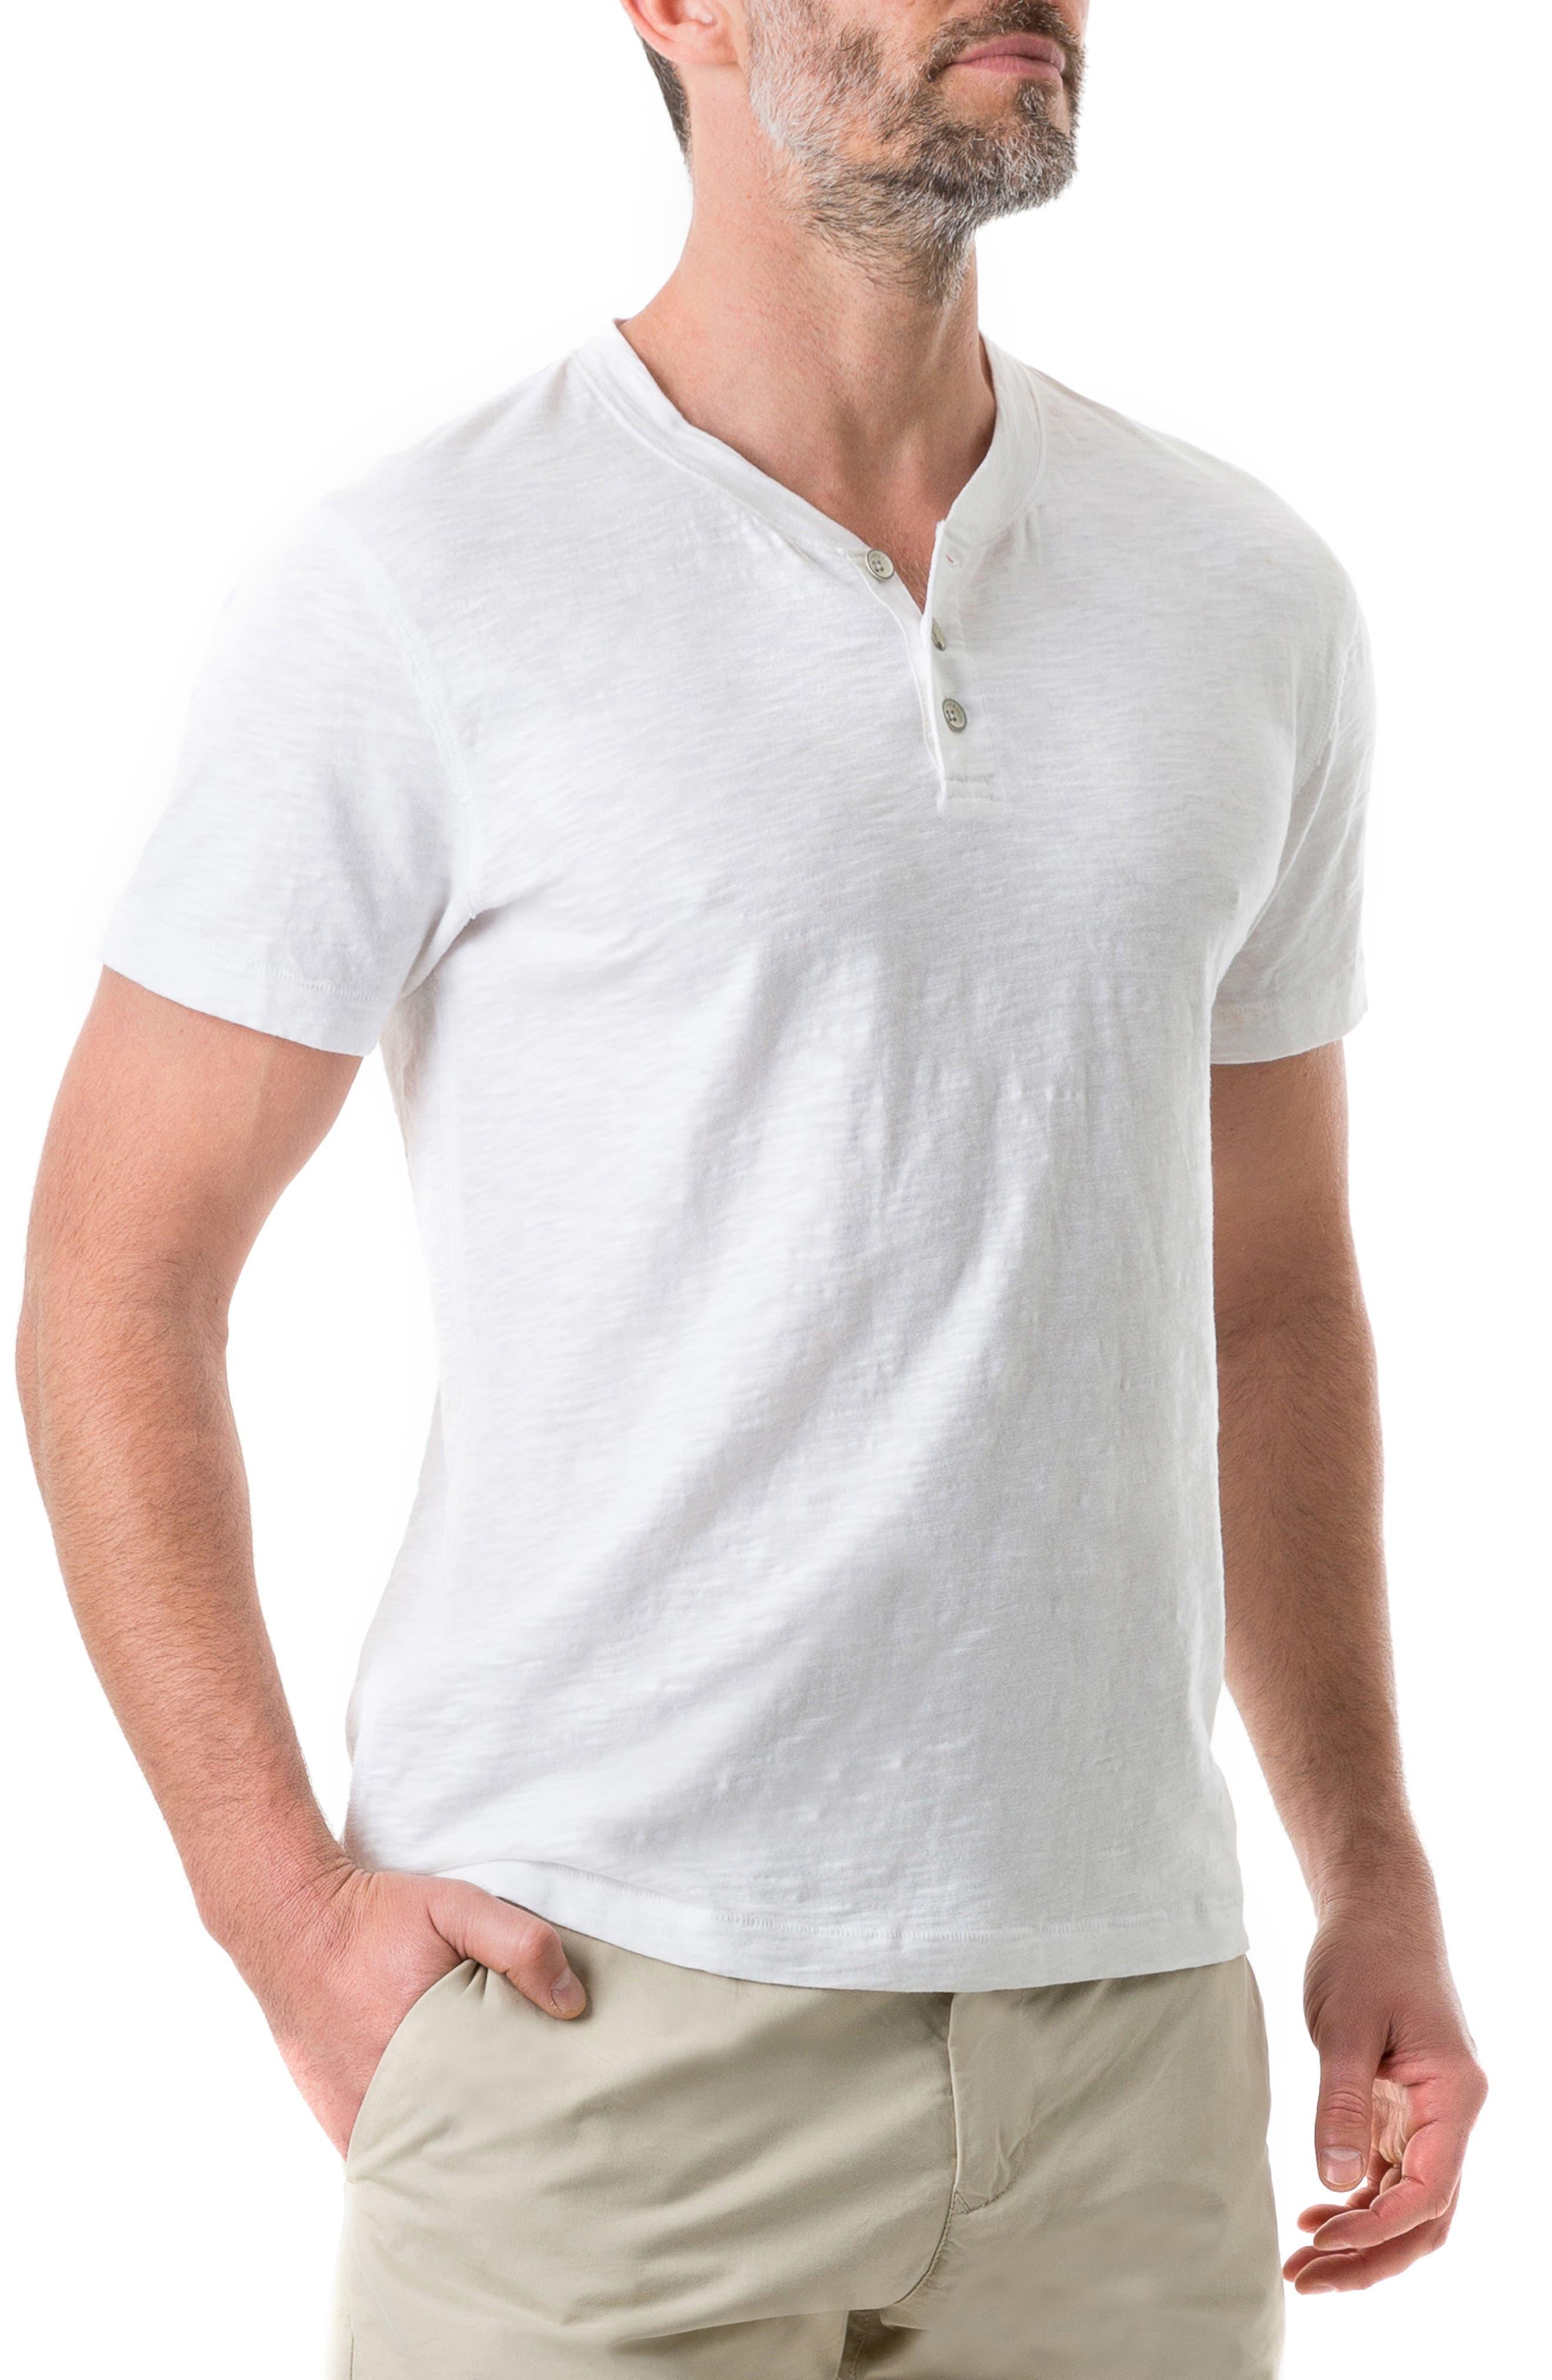 RODD & GUNN,                             Milton Henley T-Shirt,                             Alternate thumbnail 3, color,                             NATURAL